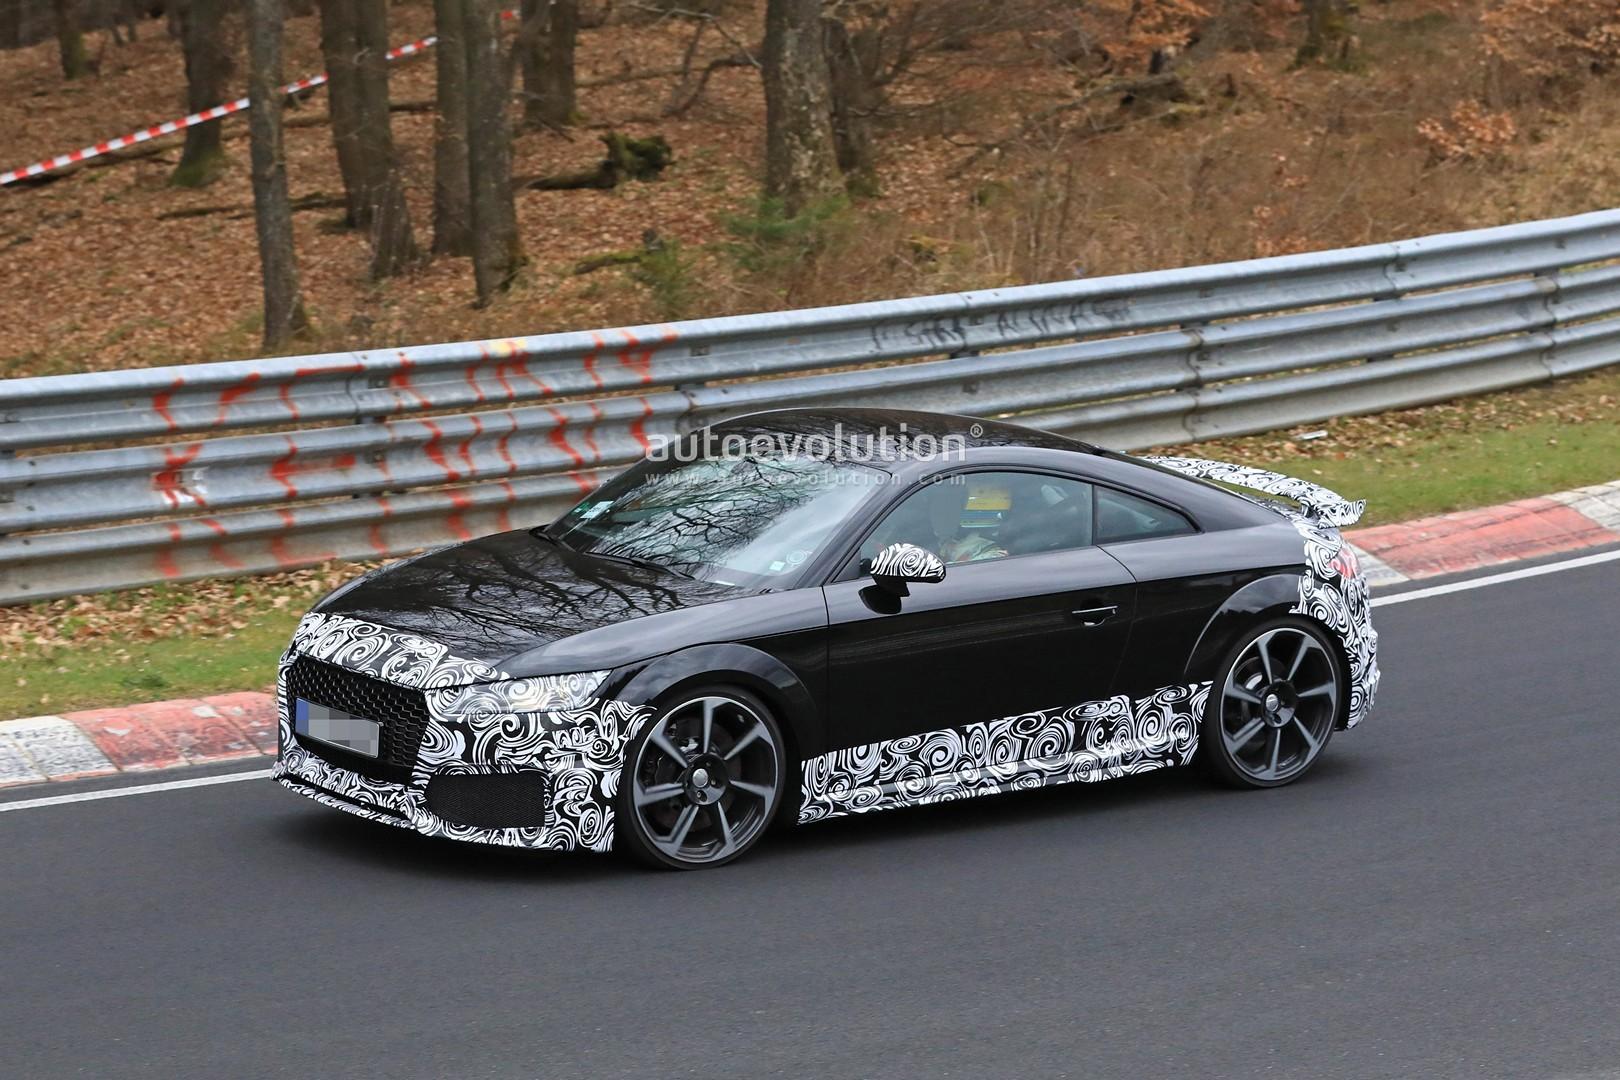 Spyshots: 2019 Audi TT RS Facelift Testing at the ...